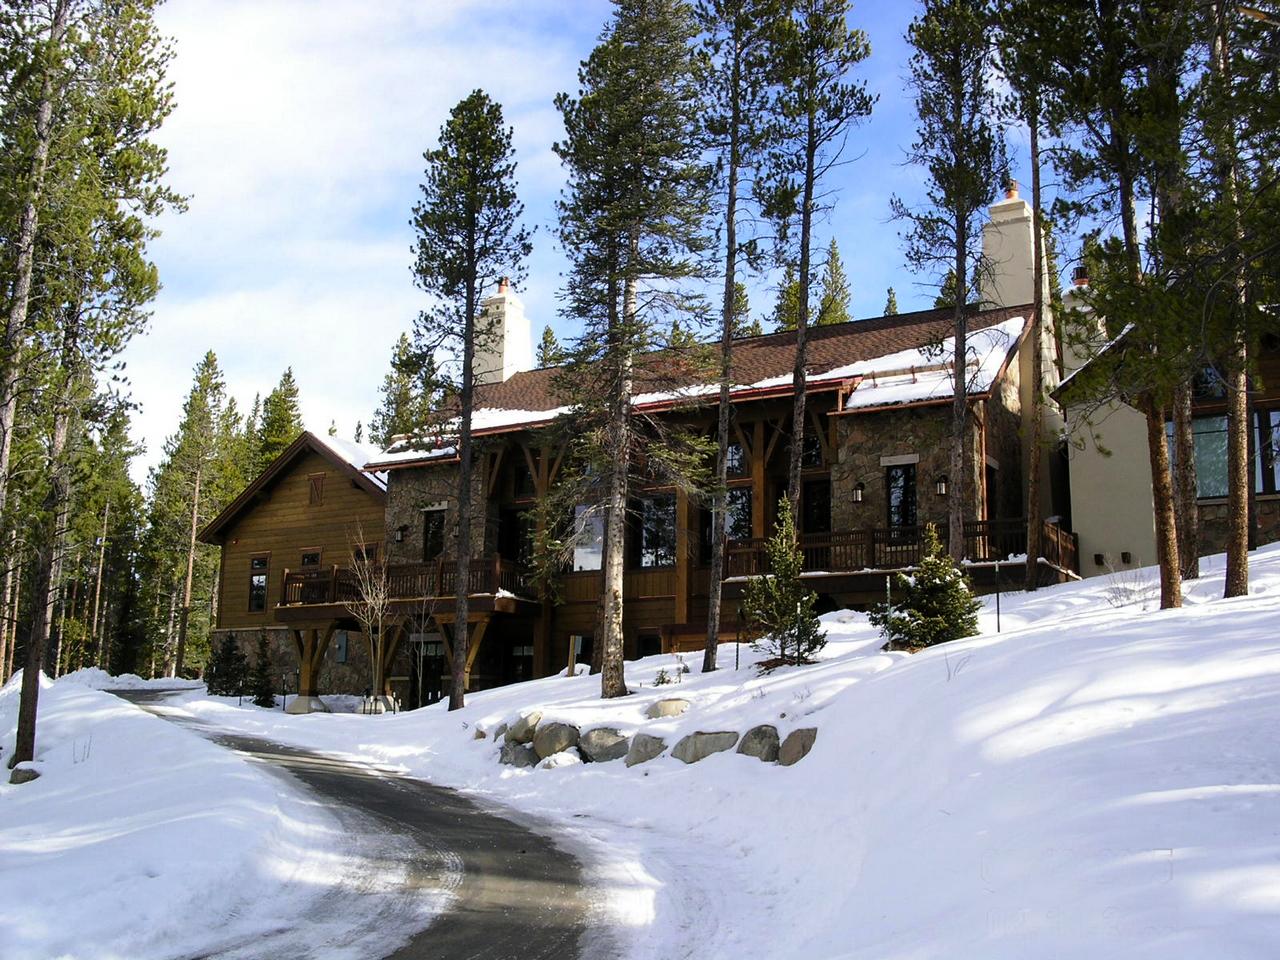 Highlands Res - Breckenridge, CO